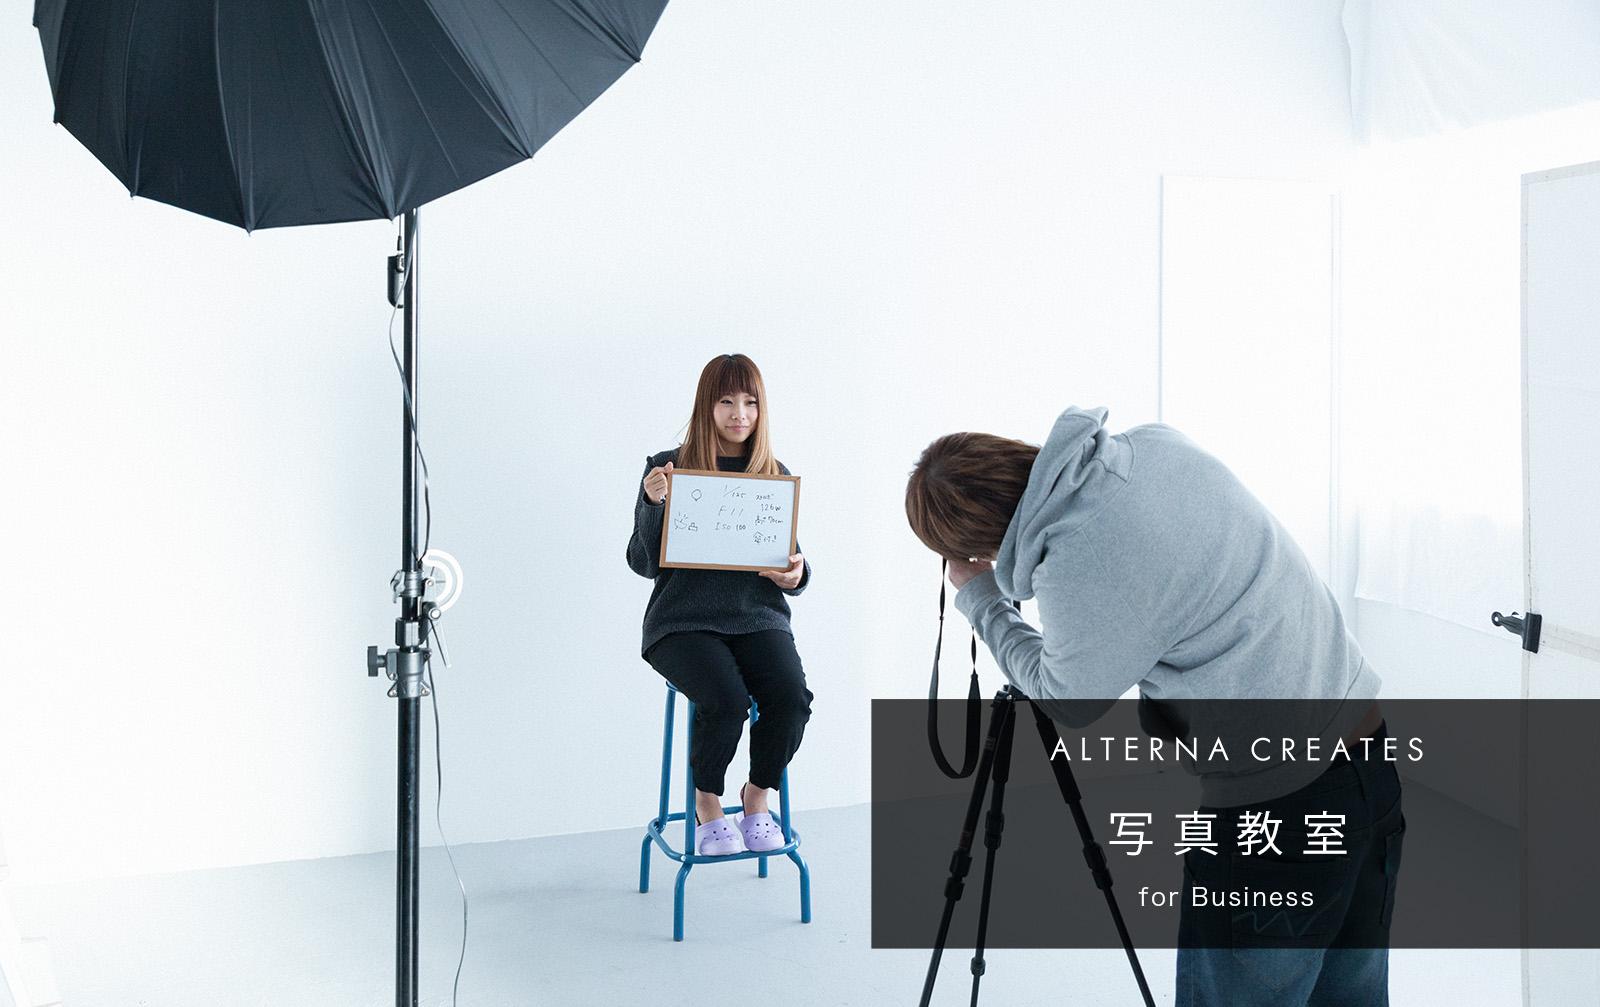 ALTERNA CREATESの写真教室・出張写真教室